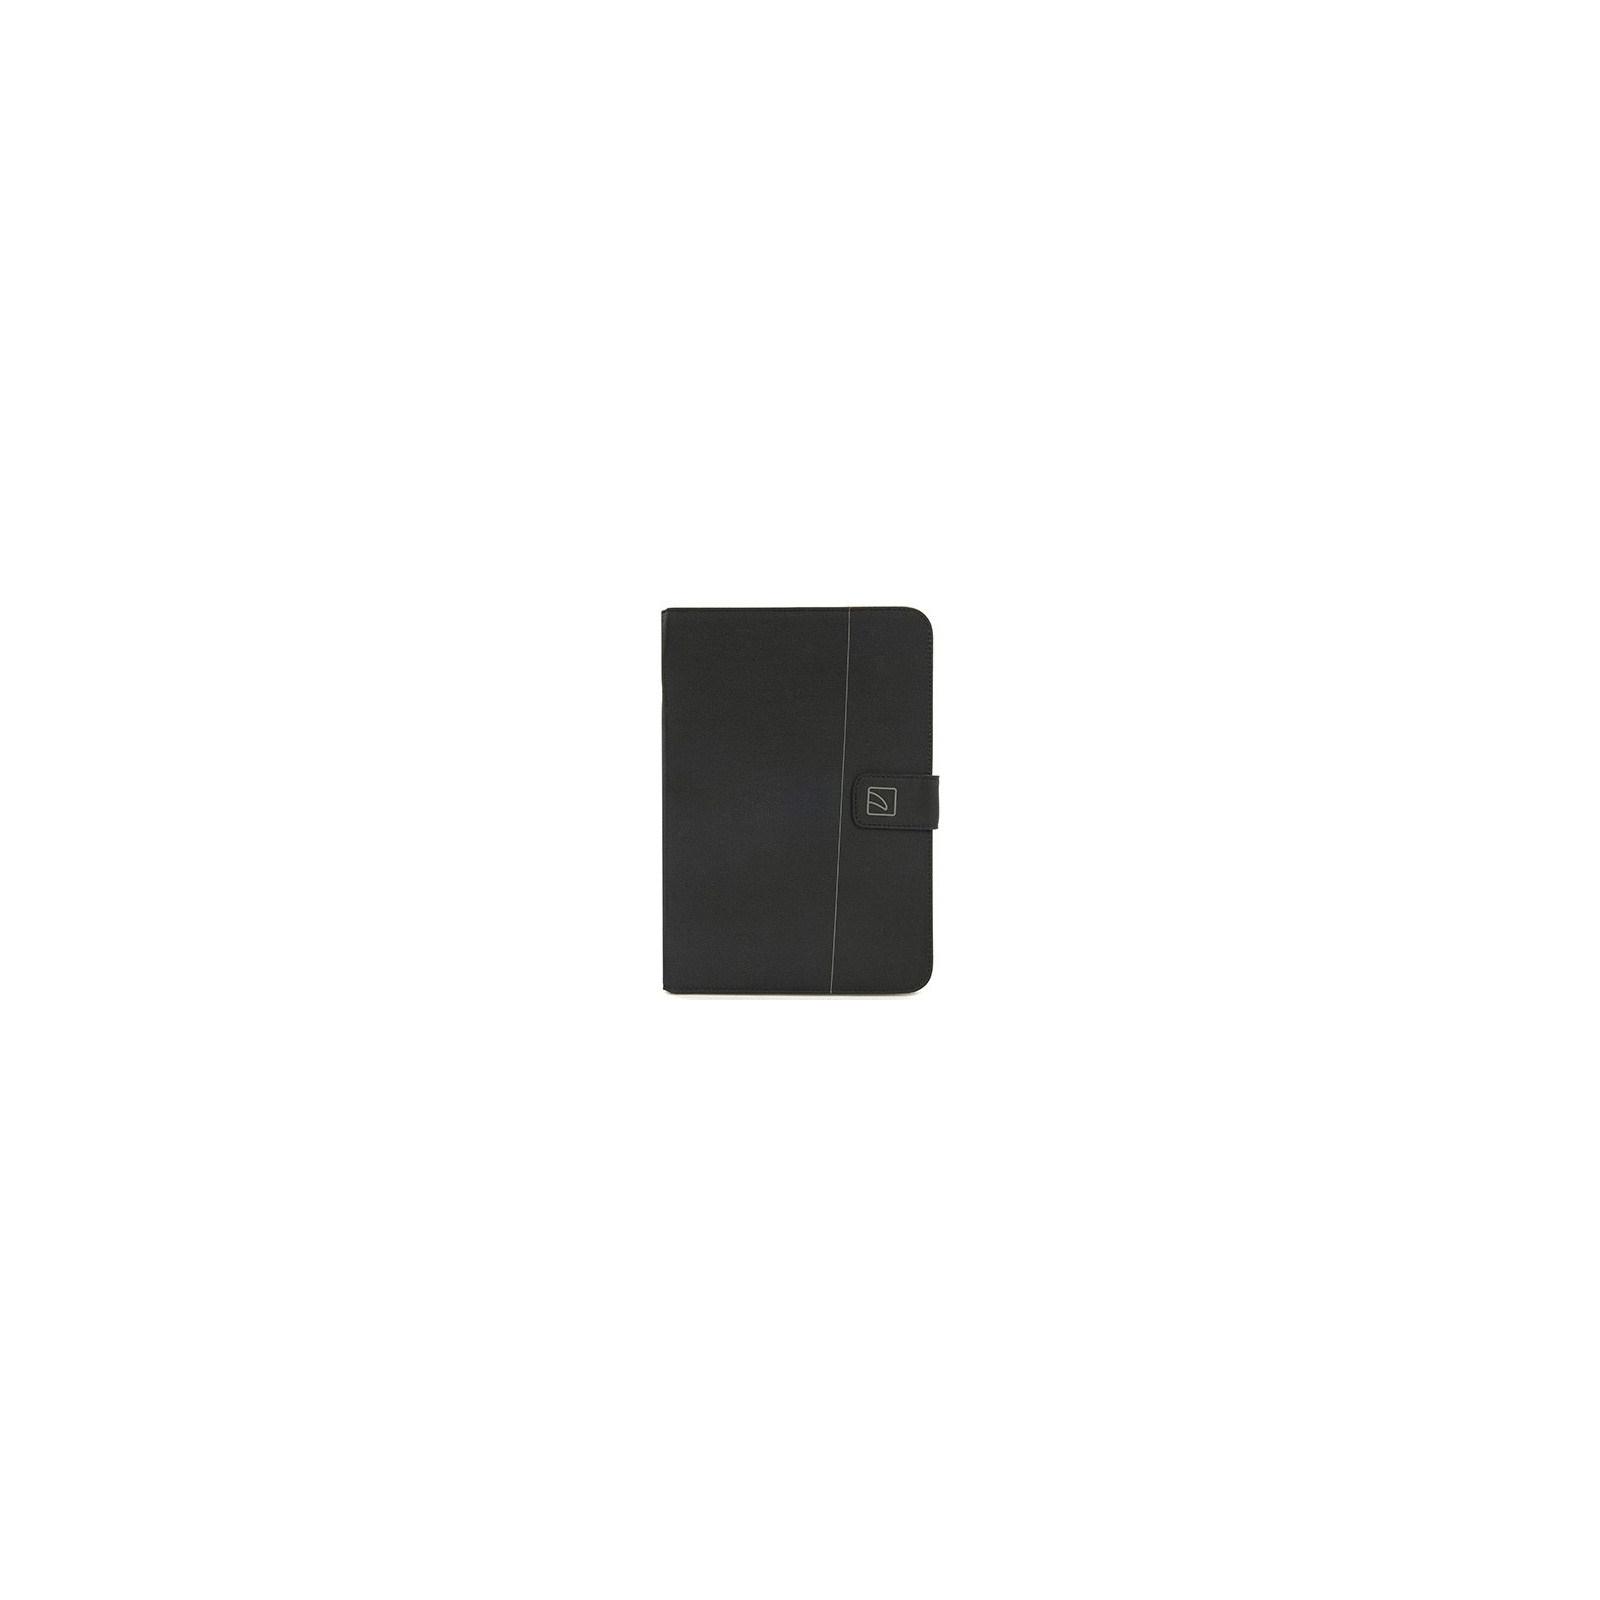 "Чехол для планшета Tucano 10"" Facile Stand Black (TAB-FA10)"